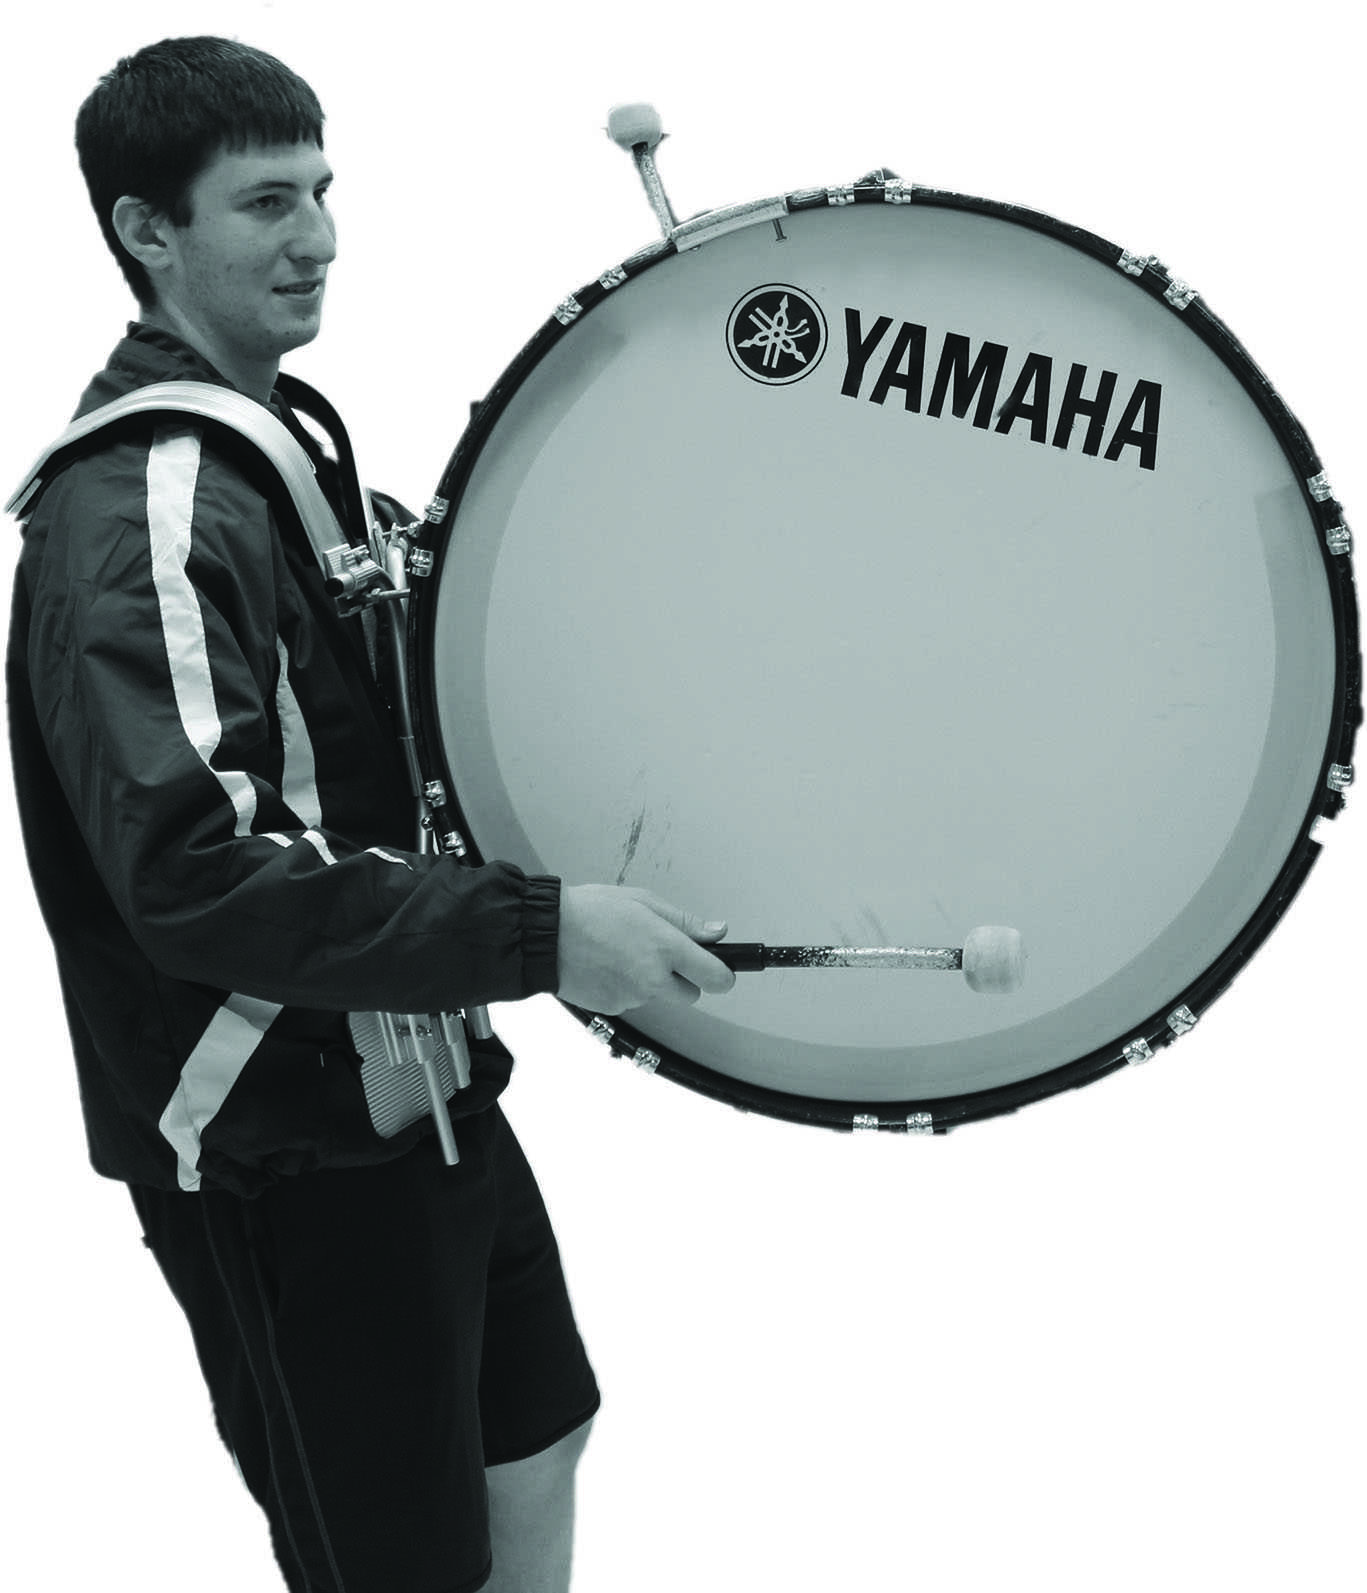 Senior CJ Snow plays the bass drum.